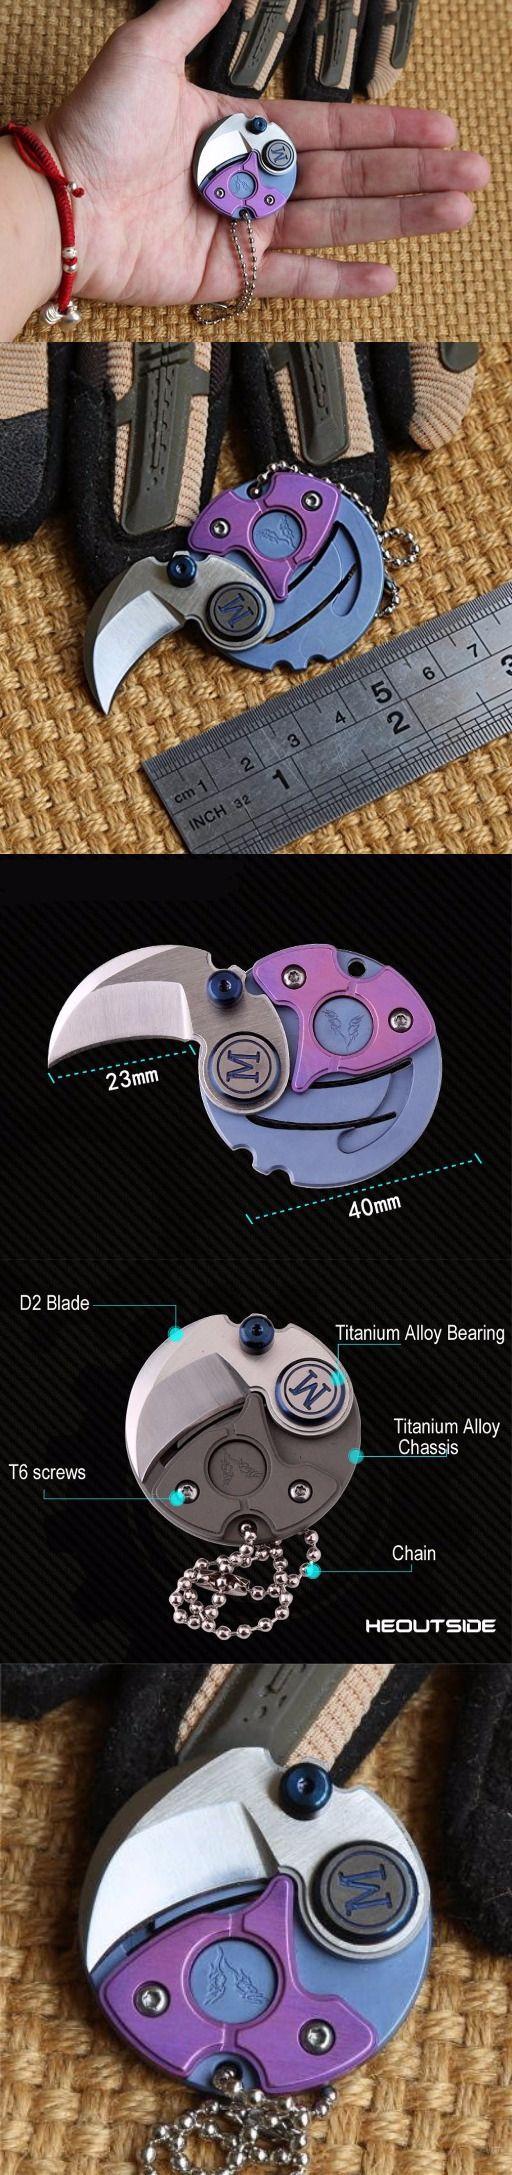 Heoutside Coin Folding Knife Titanium Alloy Luxury Creative COINS Mini Self-Defense Circular Pocket Knife Key Pendant of Every Day Carry (EDC) Specialty Defense Knives KEY